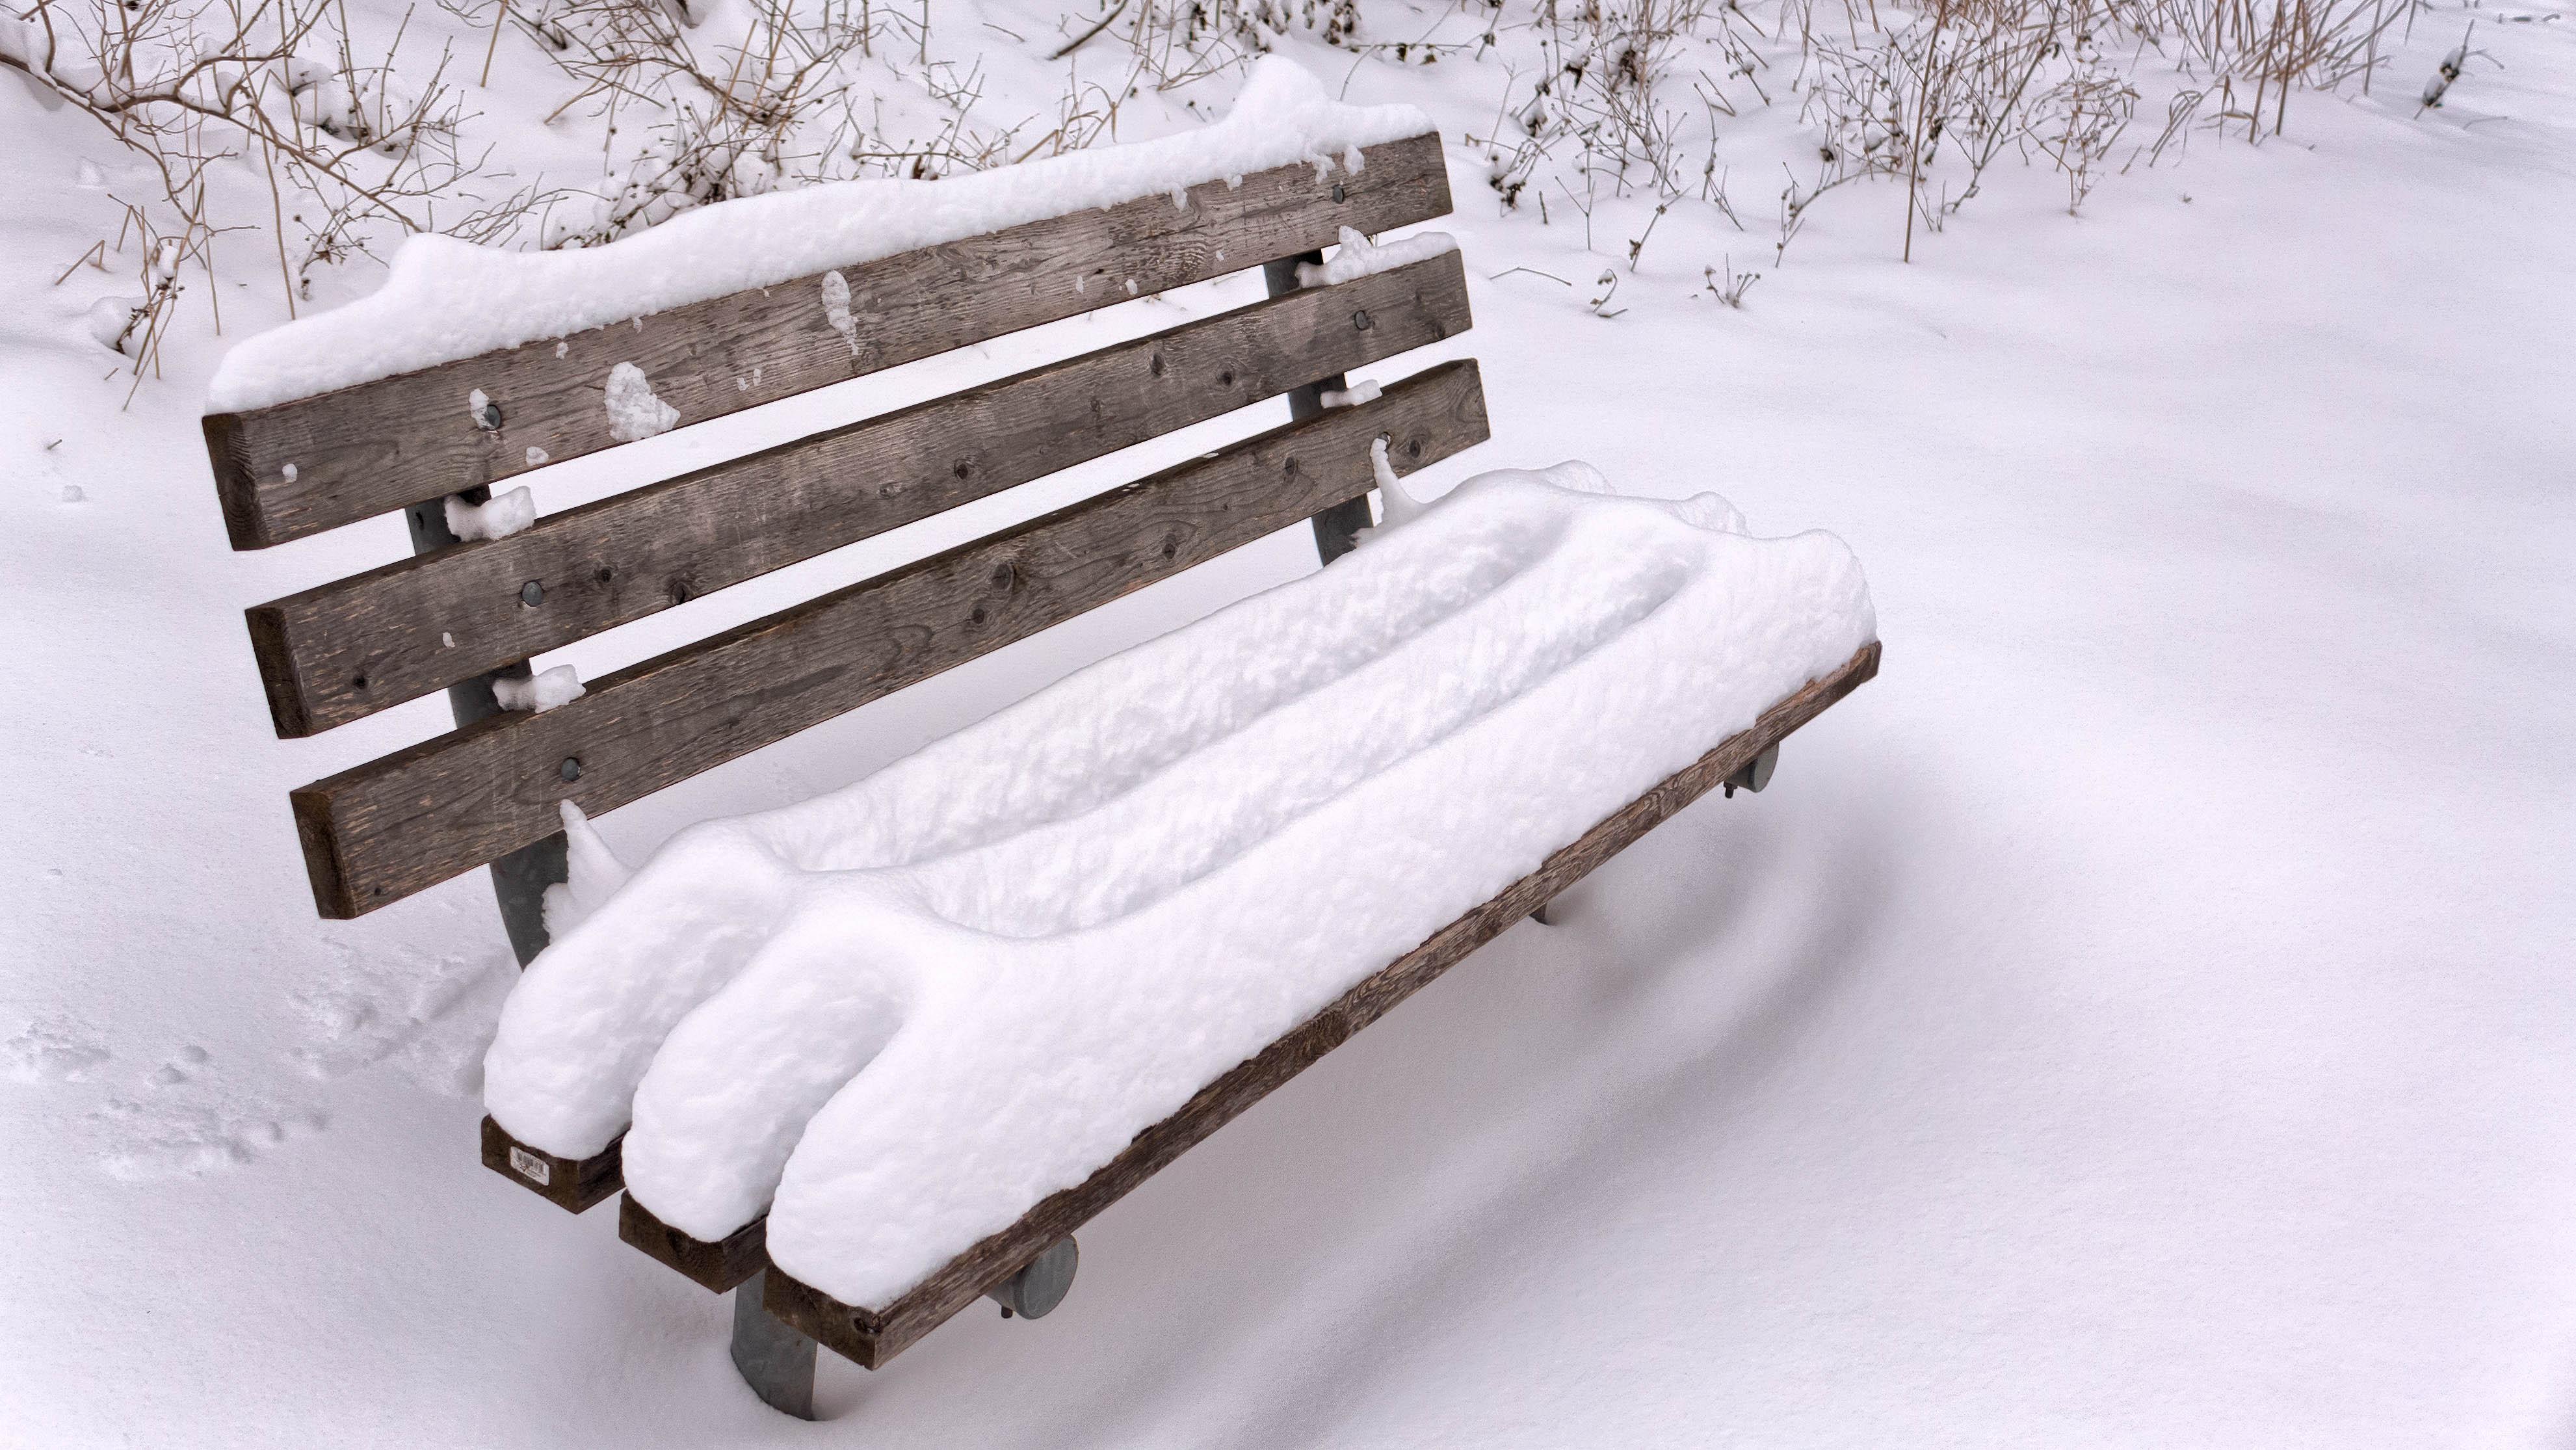 скамейка под снегом картинки сковороду налить масла